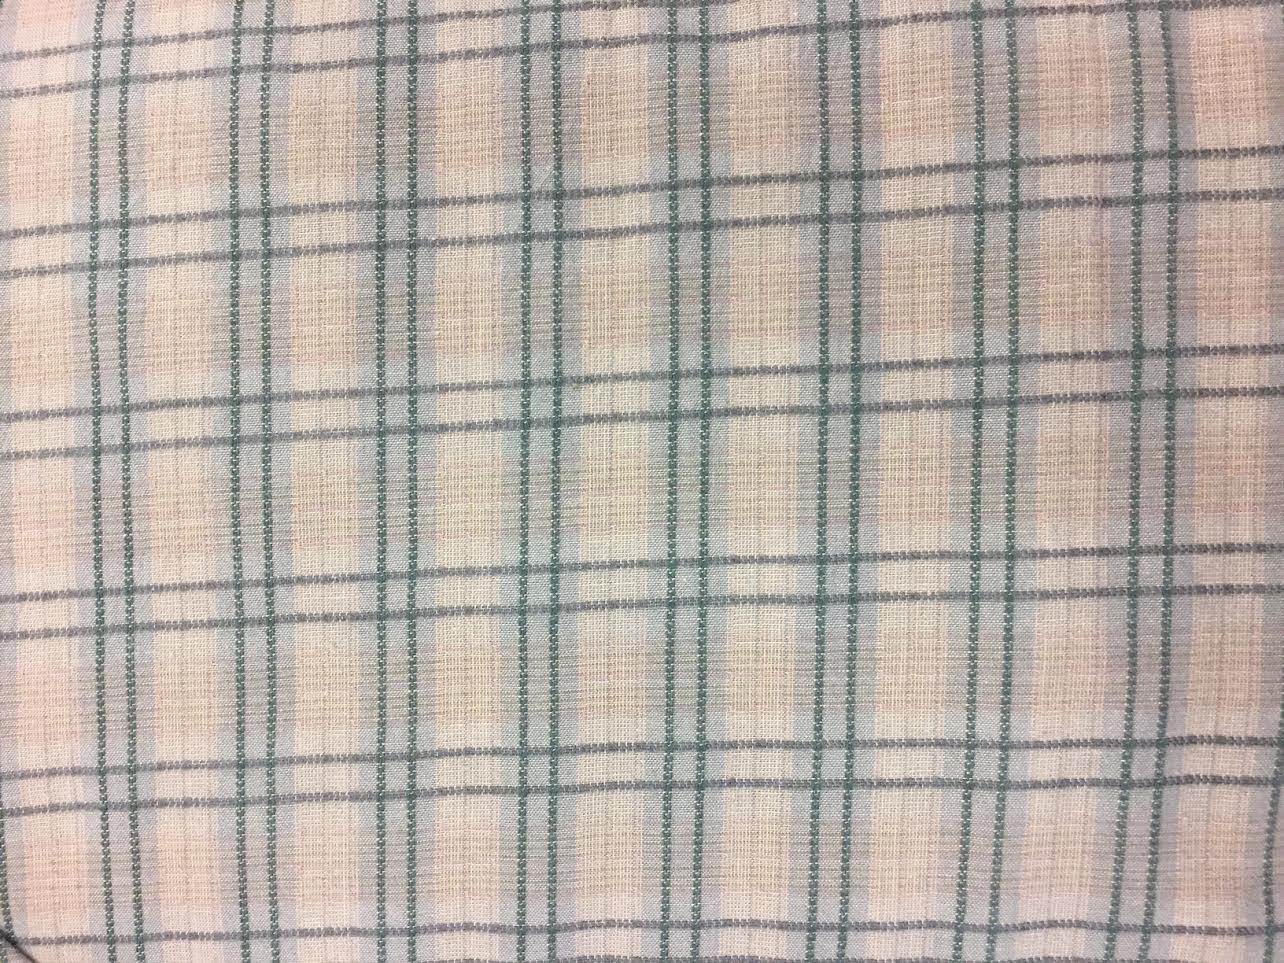 European Taupe IV-Clothworks-Kinkame-KEUP032 29